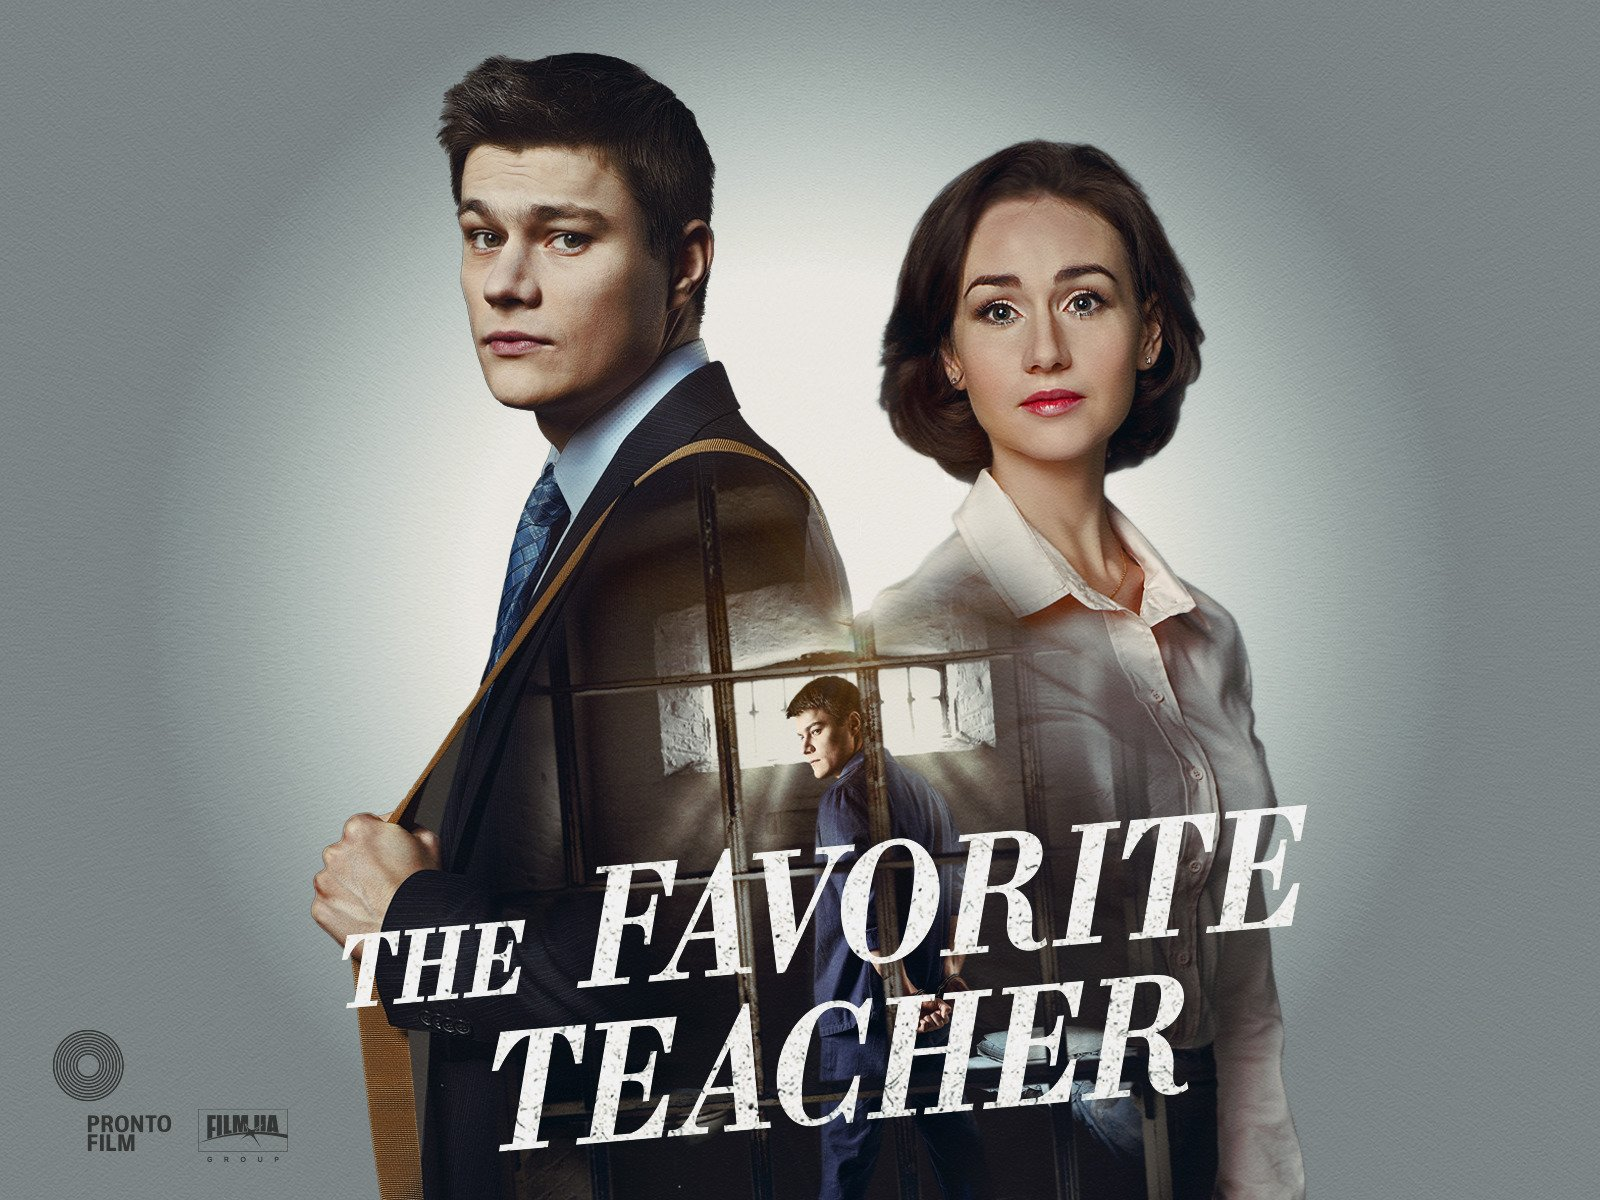 The favorite teacher